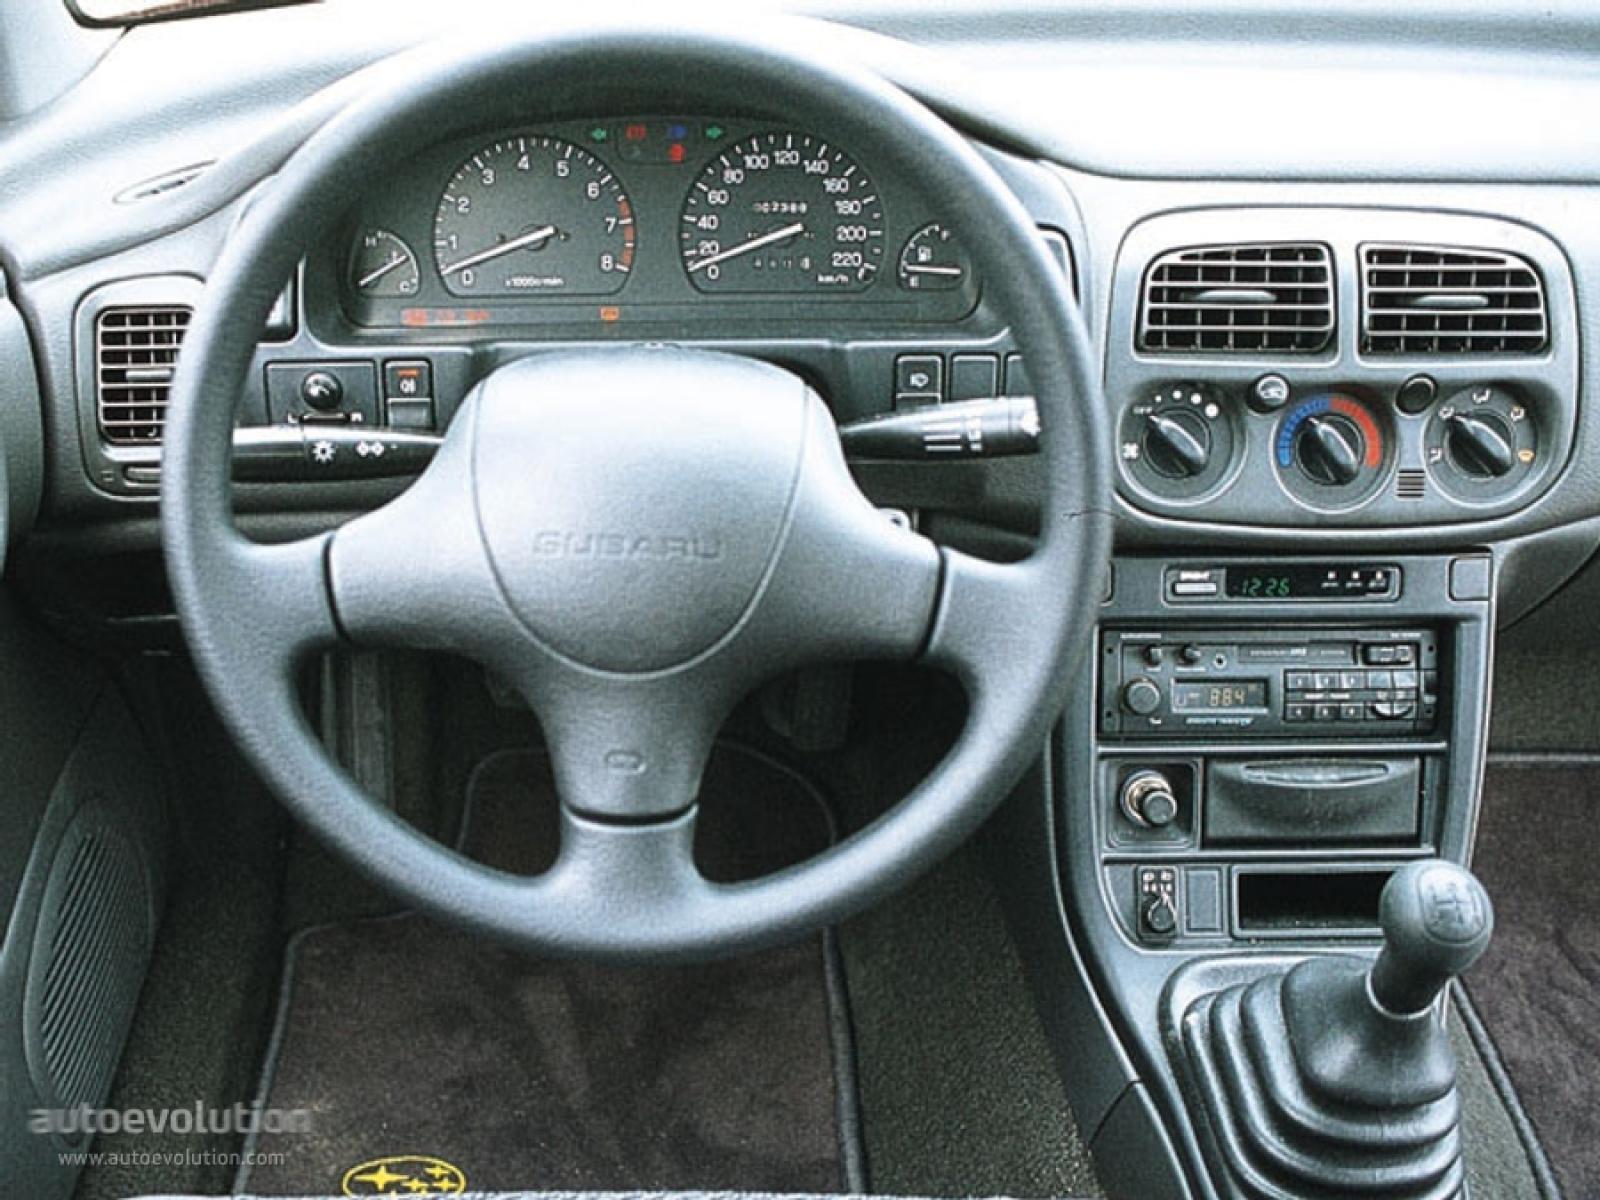 1993 Subaru Impreza 1600px Image 8 1998 Fuse Box